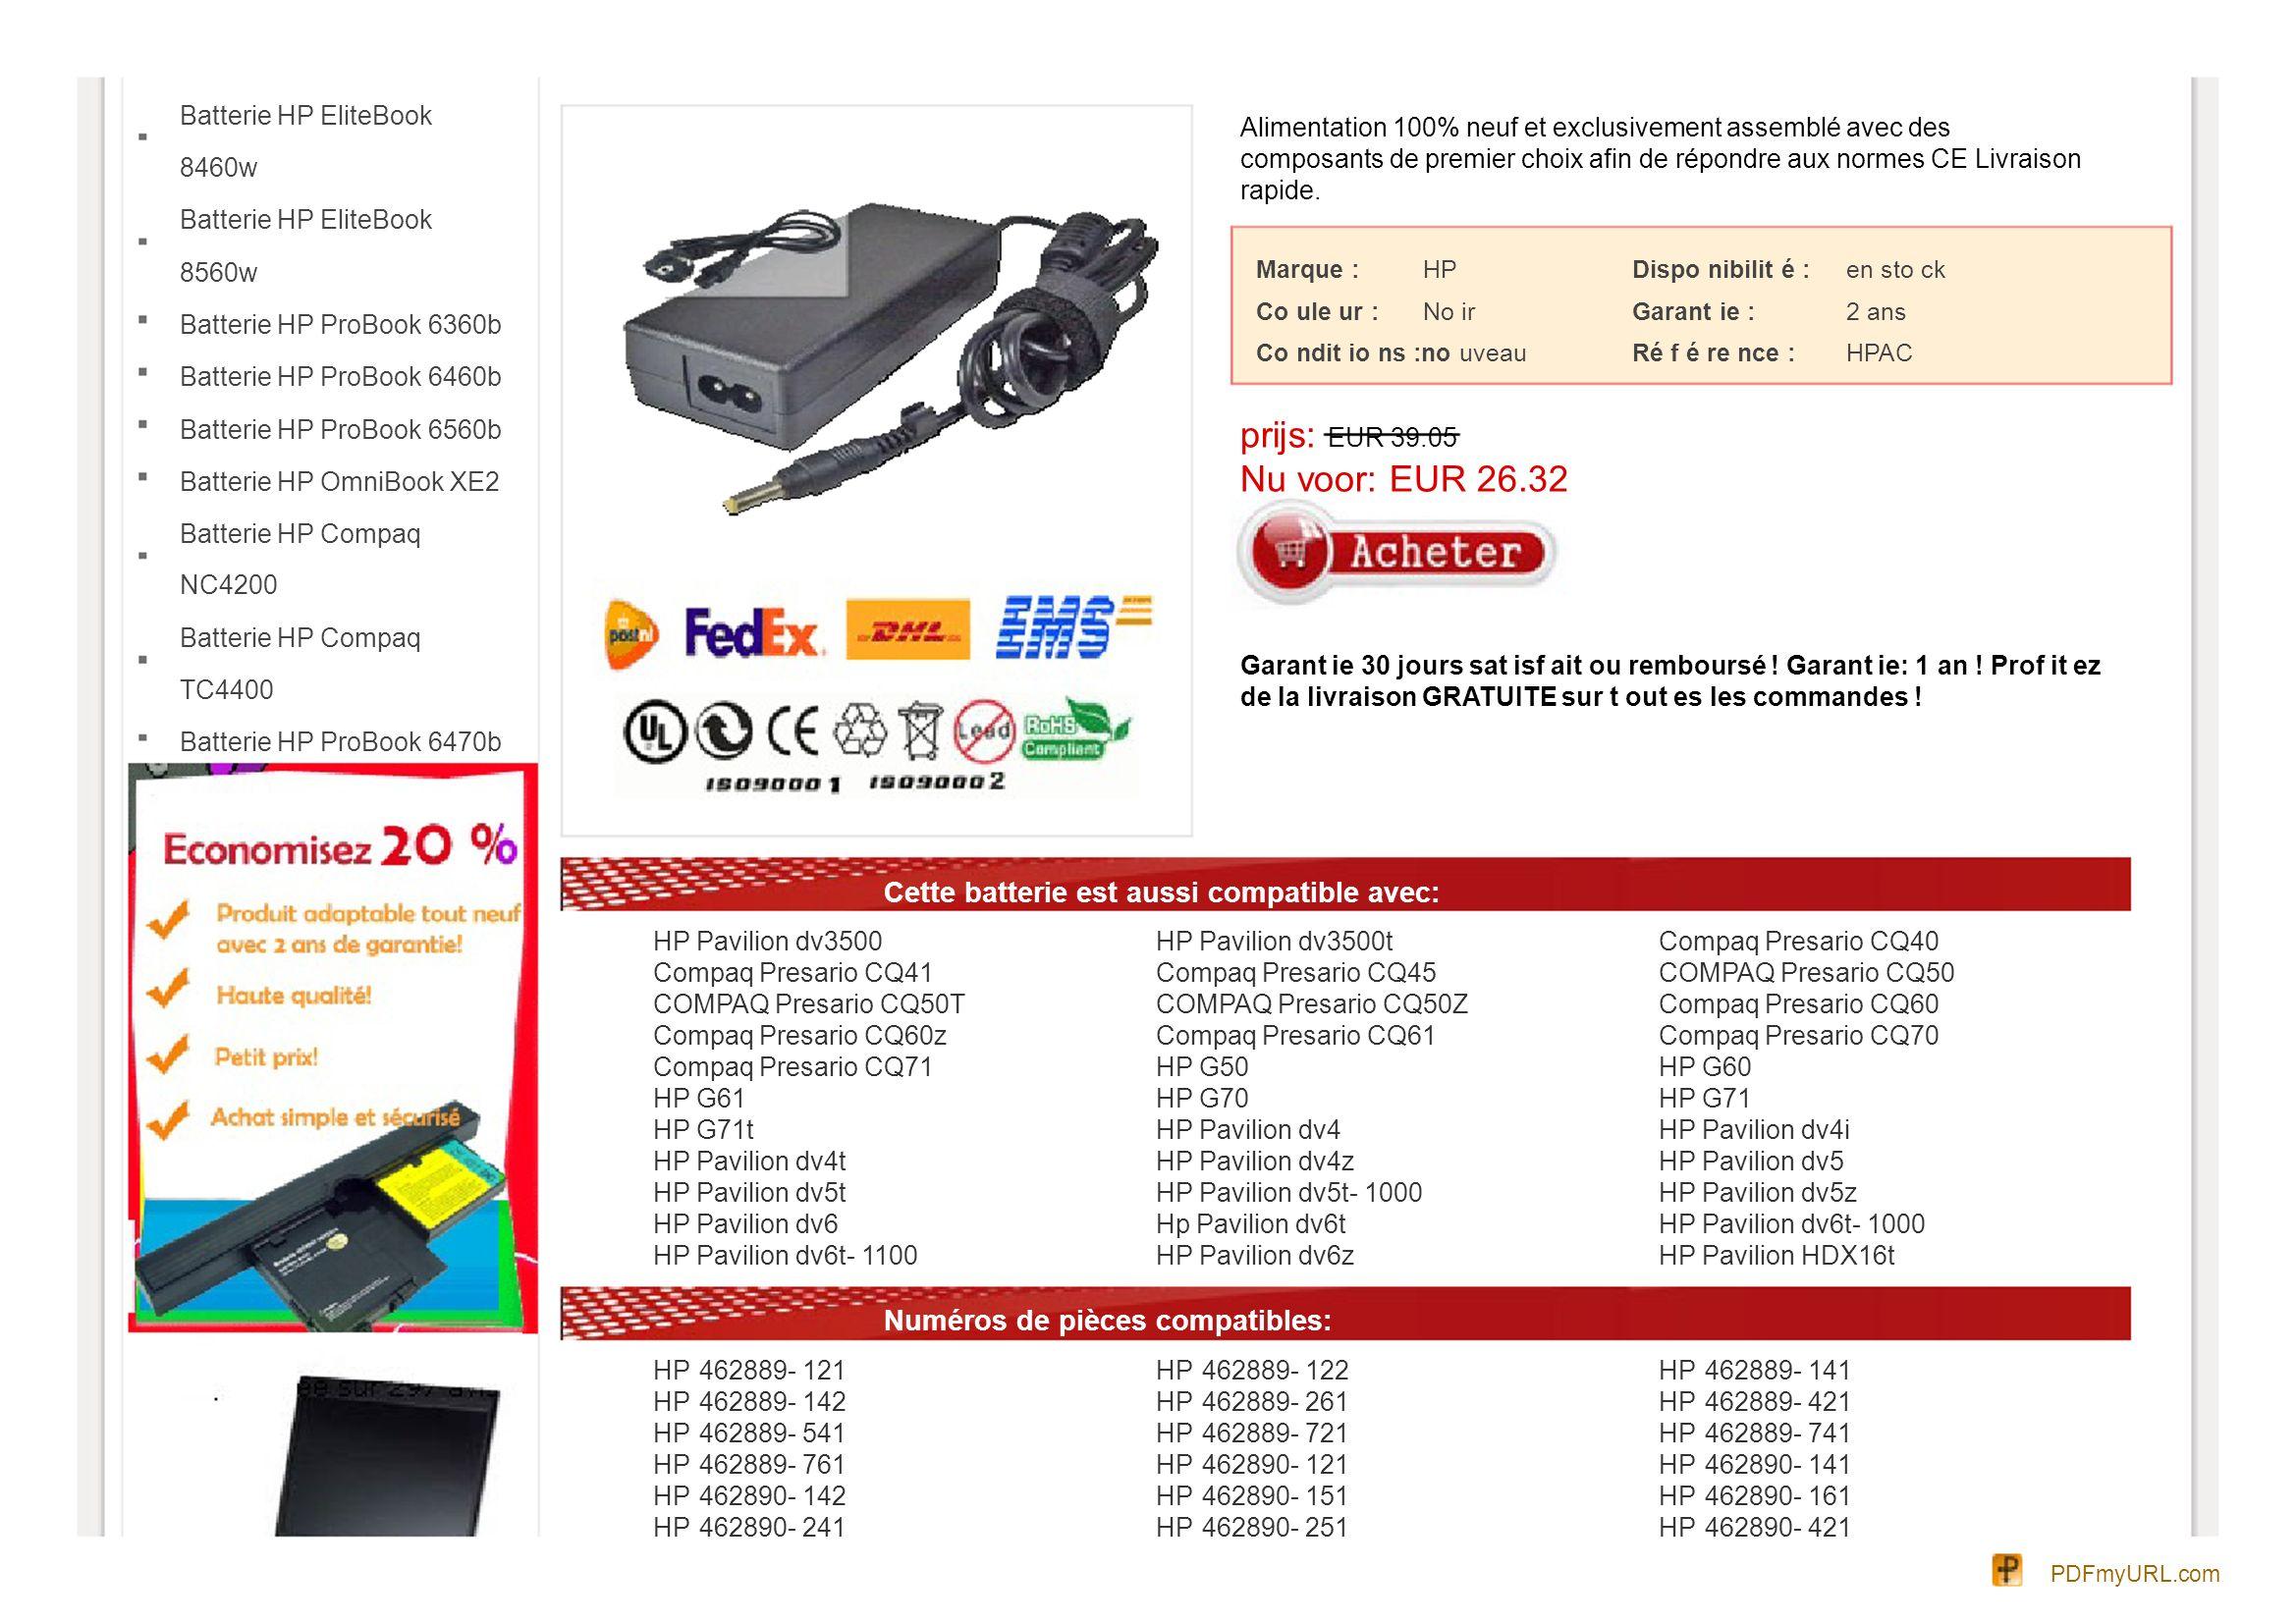 Batterie HP EliteBook 8460w Batterie HP EliteBook 8560w Batterie HP ProBook 6360b Batterie HP ProBook 6460b Batterie HP ProBook 6560b Batterie HP Omni